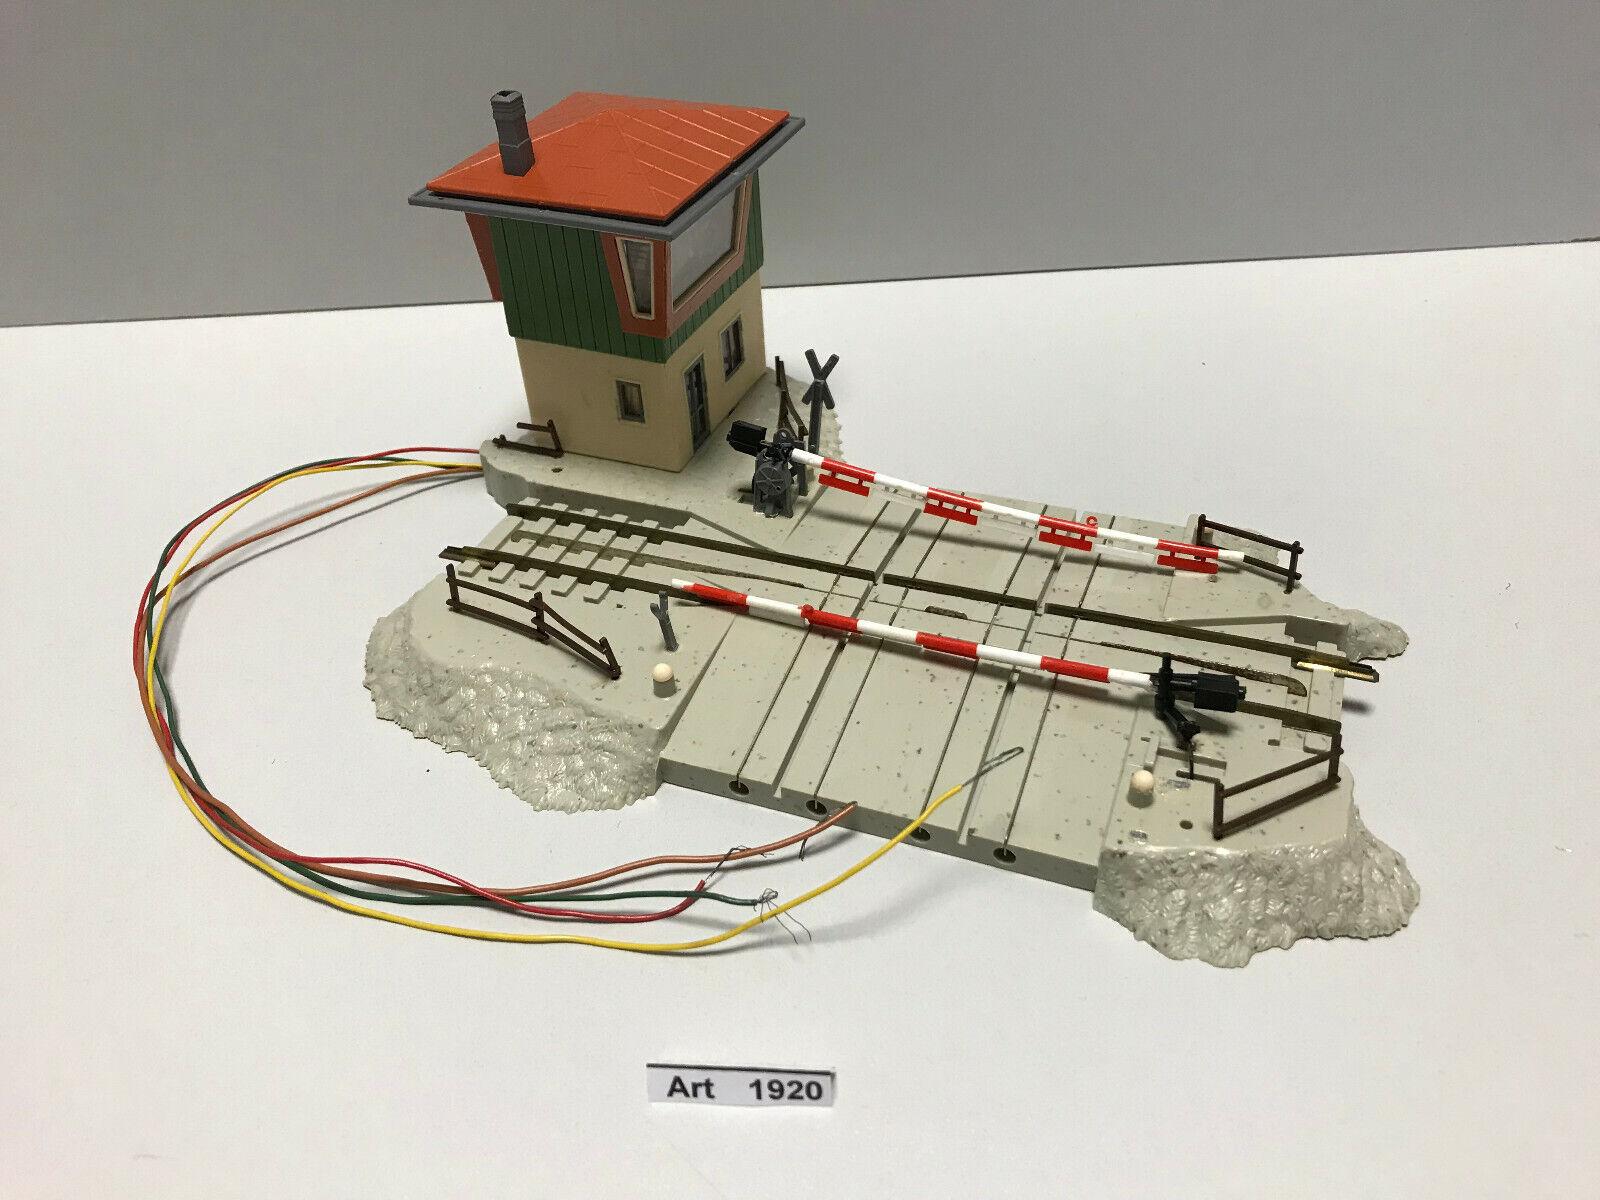 Faller B-4733 AMS Bahnübergang,elektromagnetisch, H0 ,1 87,für Bastler, RAR